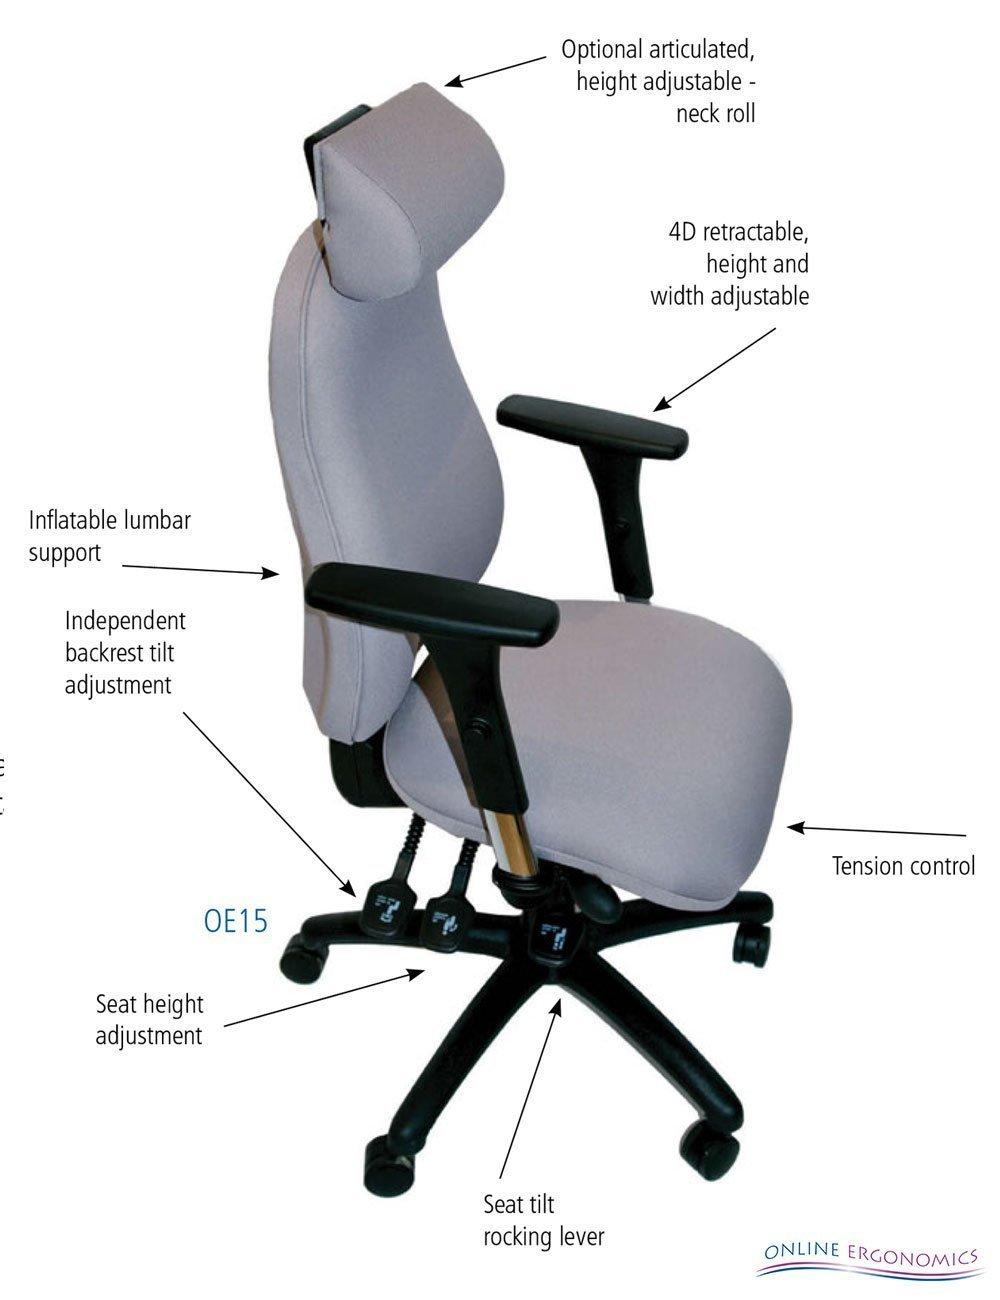 Oe15 ergonomic chair online ergonomics for Ergonomic chair